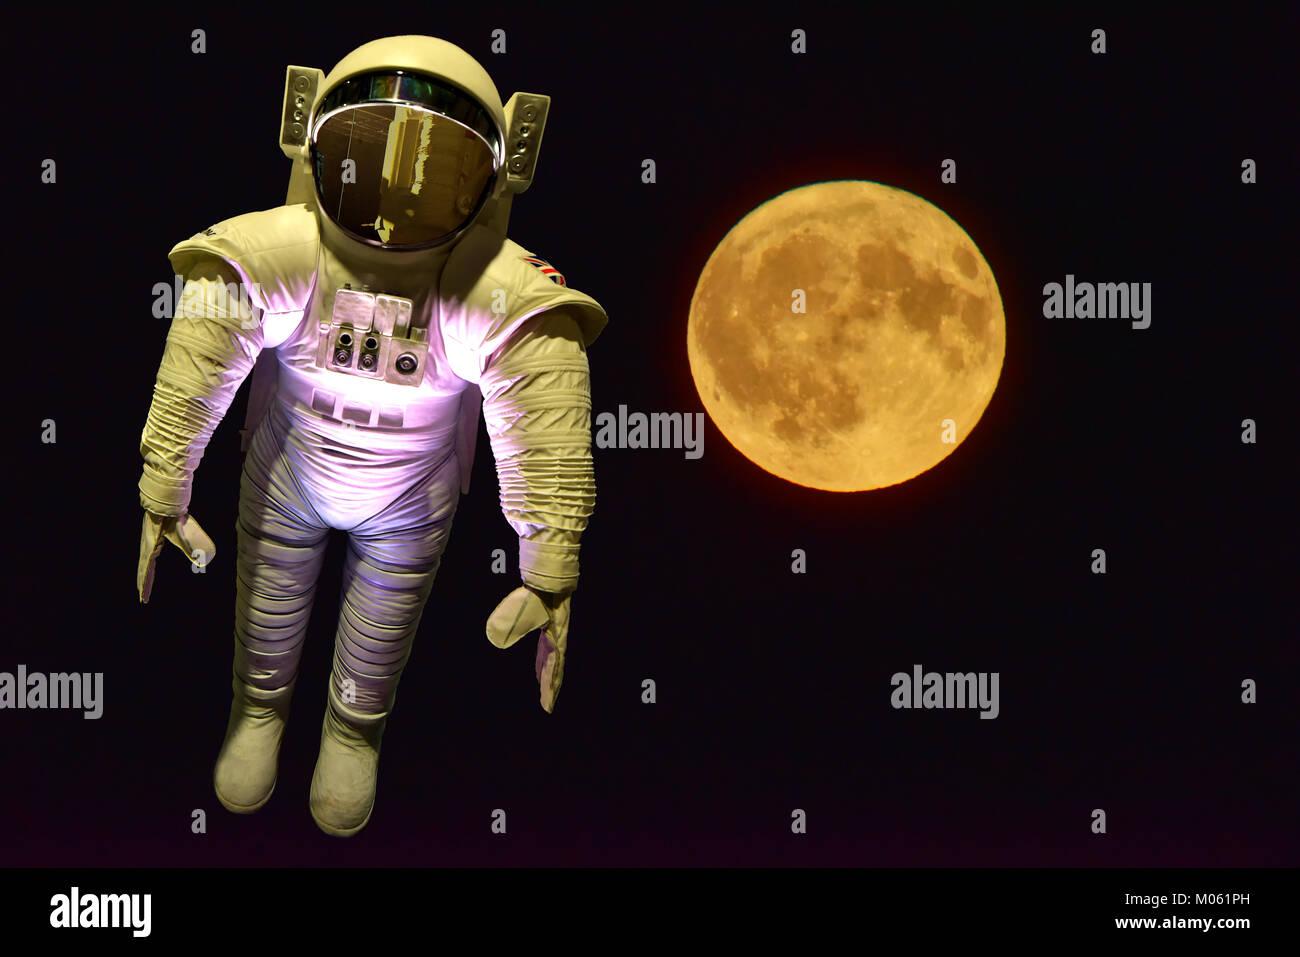 Tim Peakes Soyuz Russian mockup spacesuit with moon background Shildon Railway Museum Stock Photo